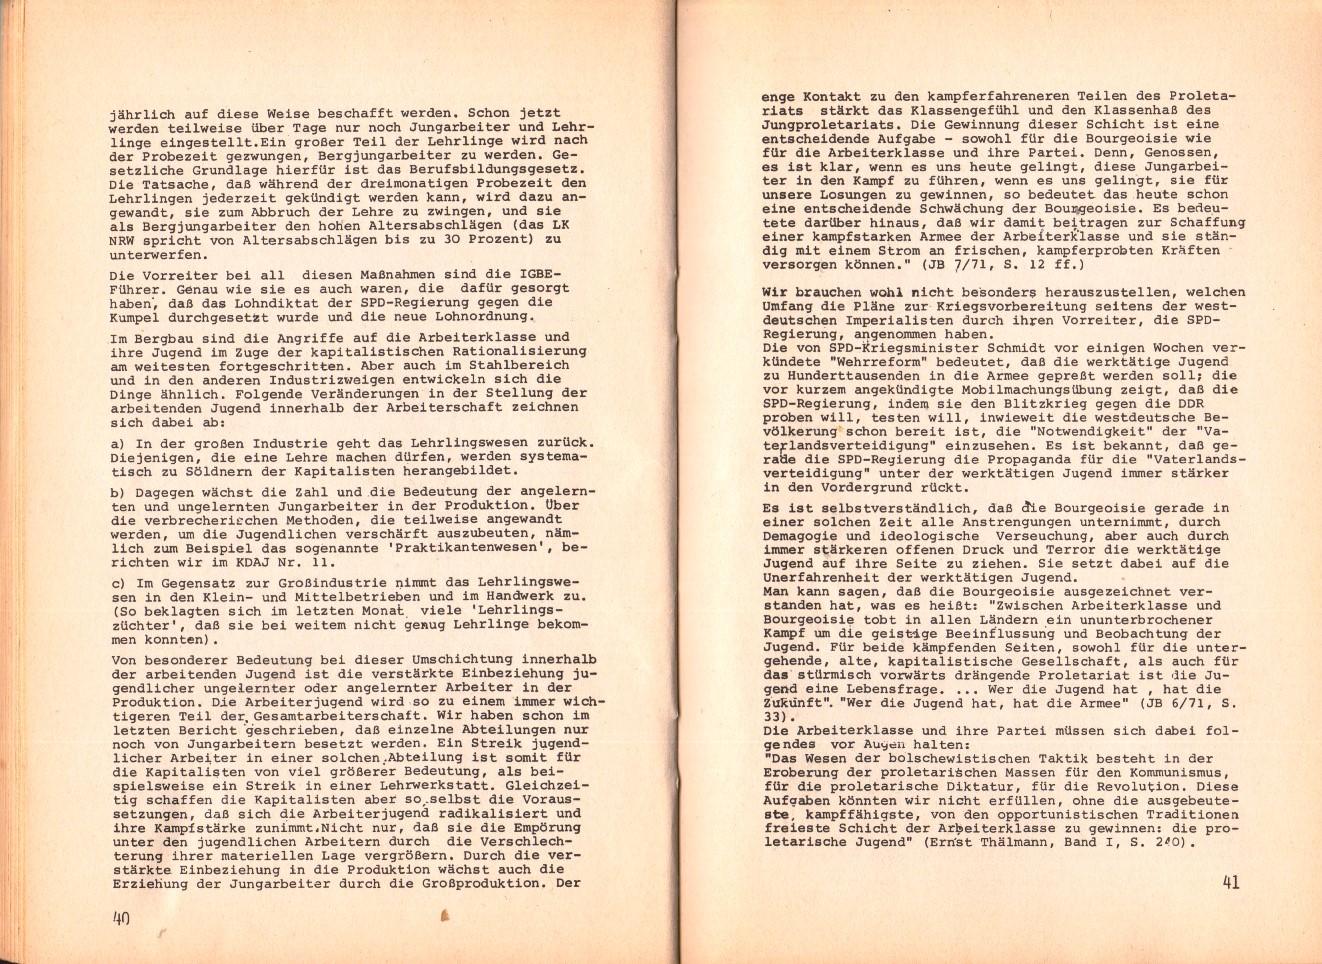 ZB_Parteiarbeiter_1971_10_22